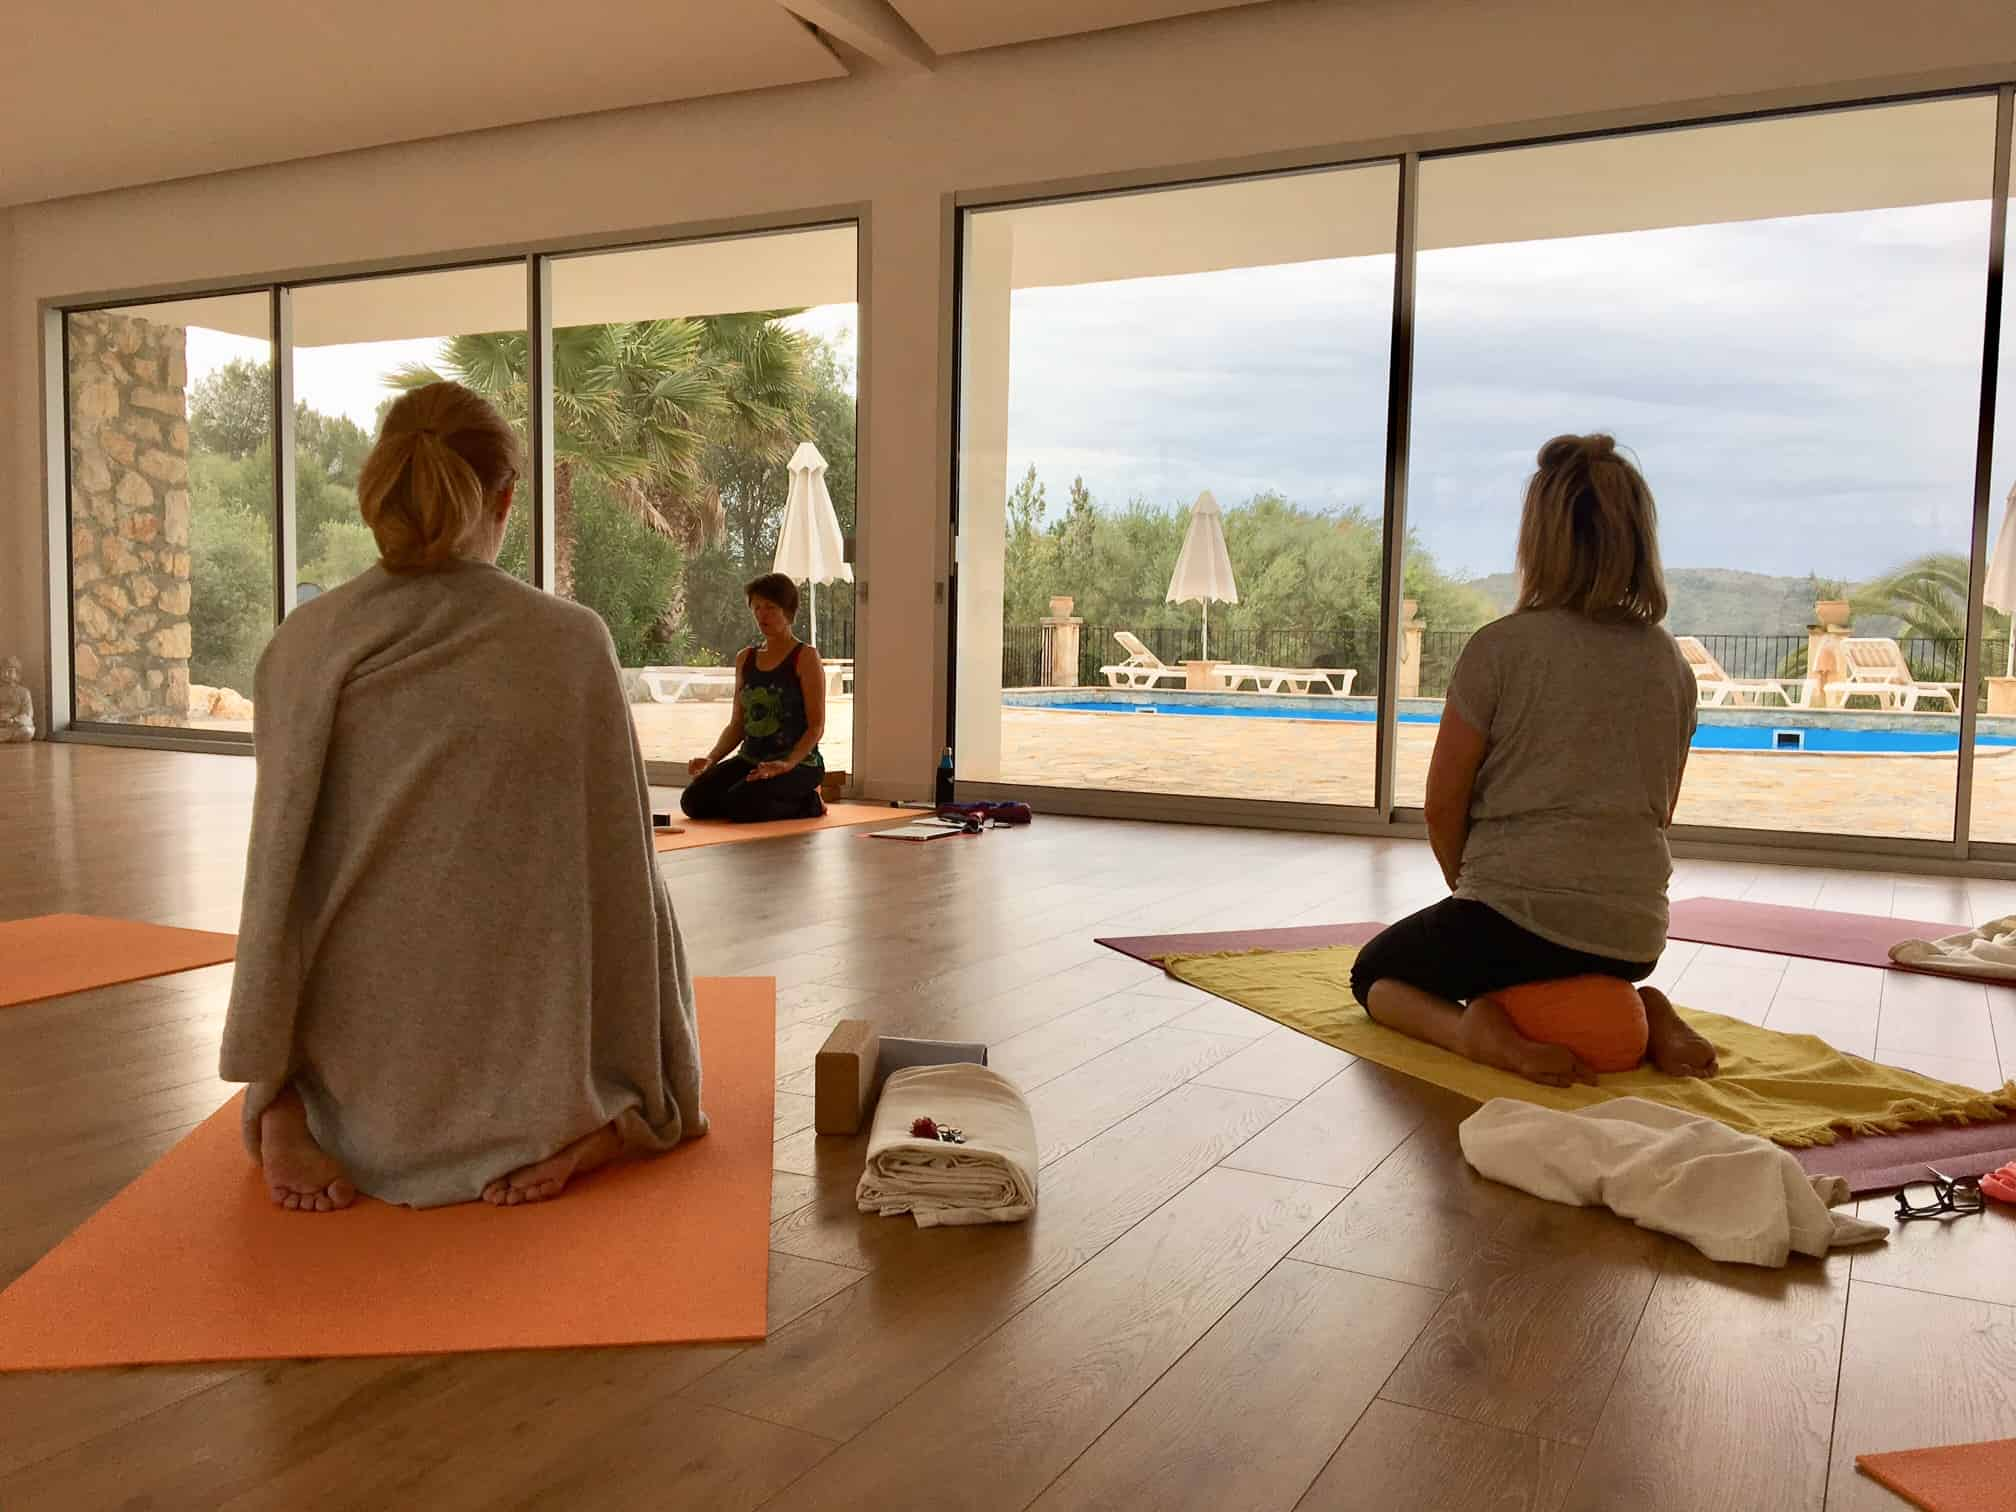 Yogaurlaub auf Mallorca